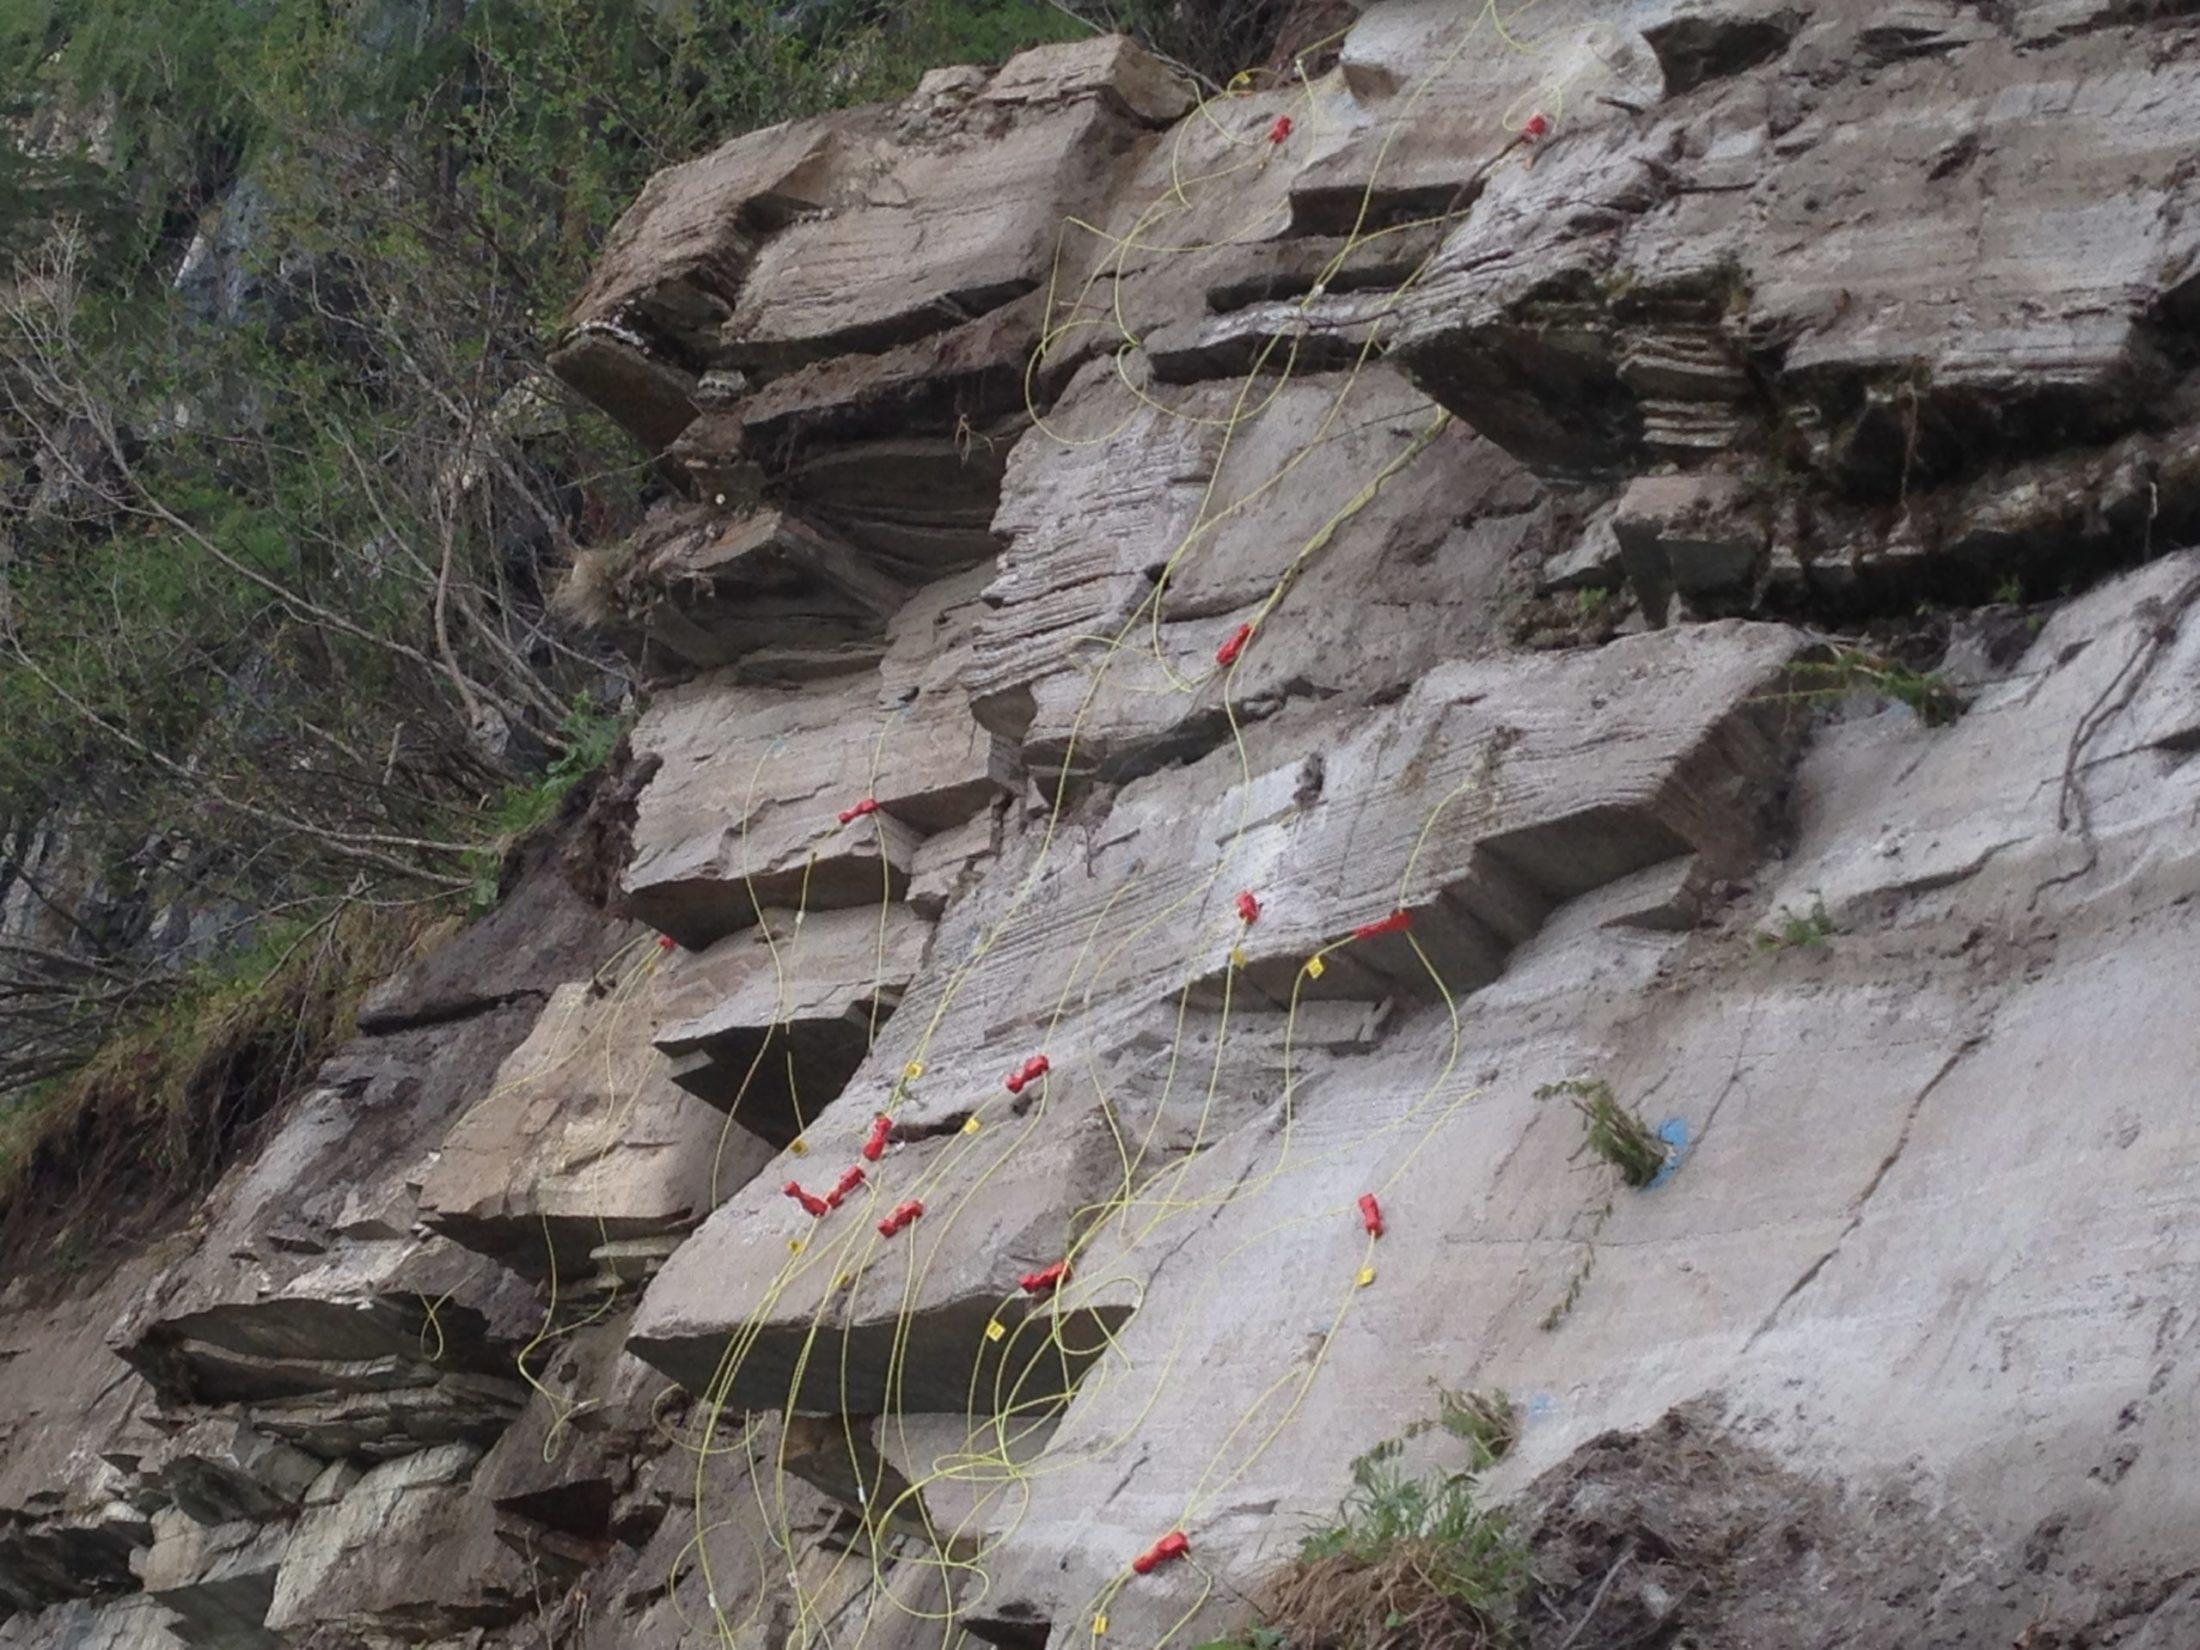 Sprengsätze im Fels mit Zündkabel